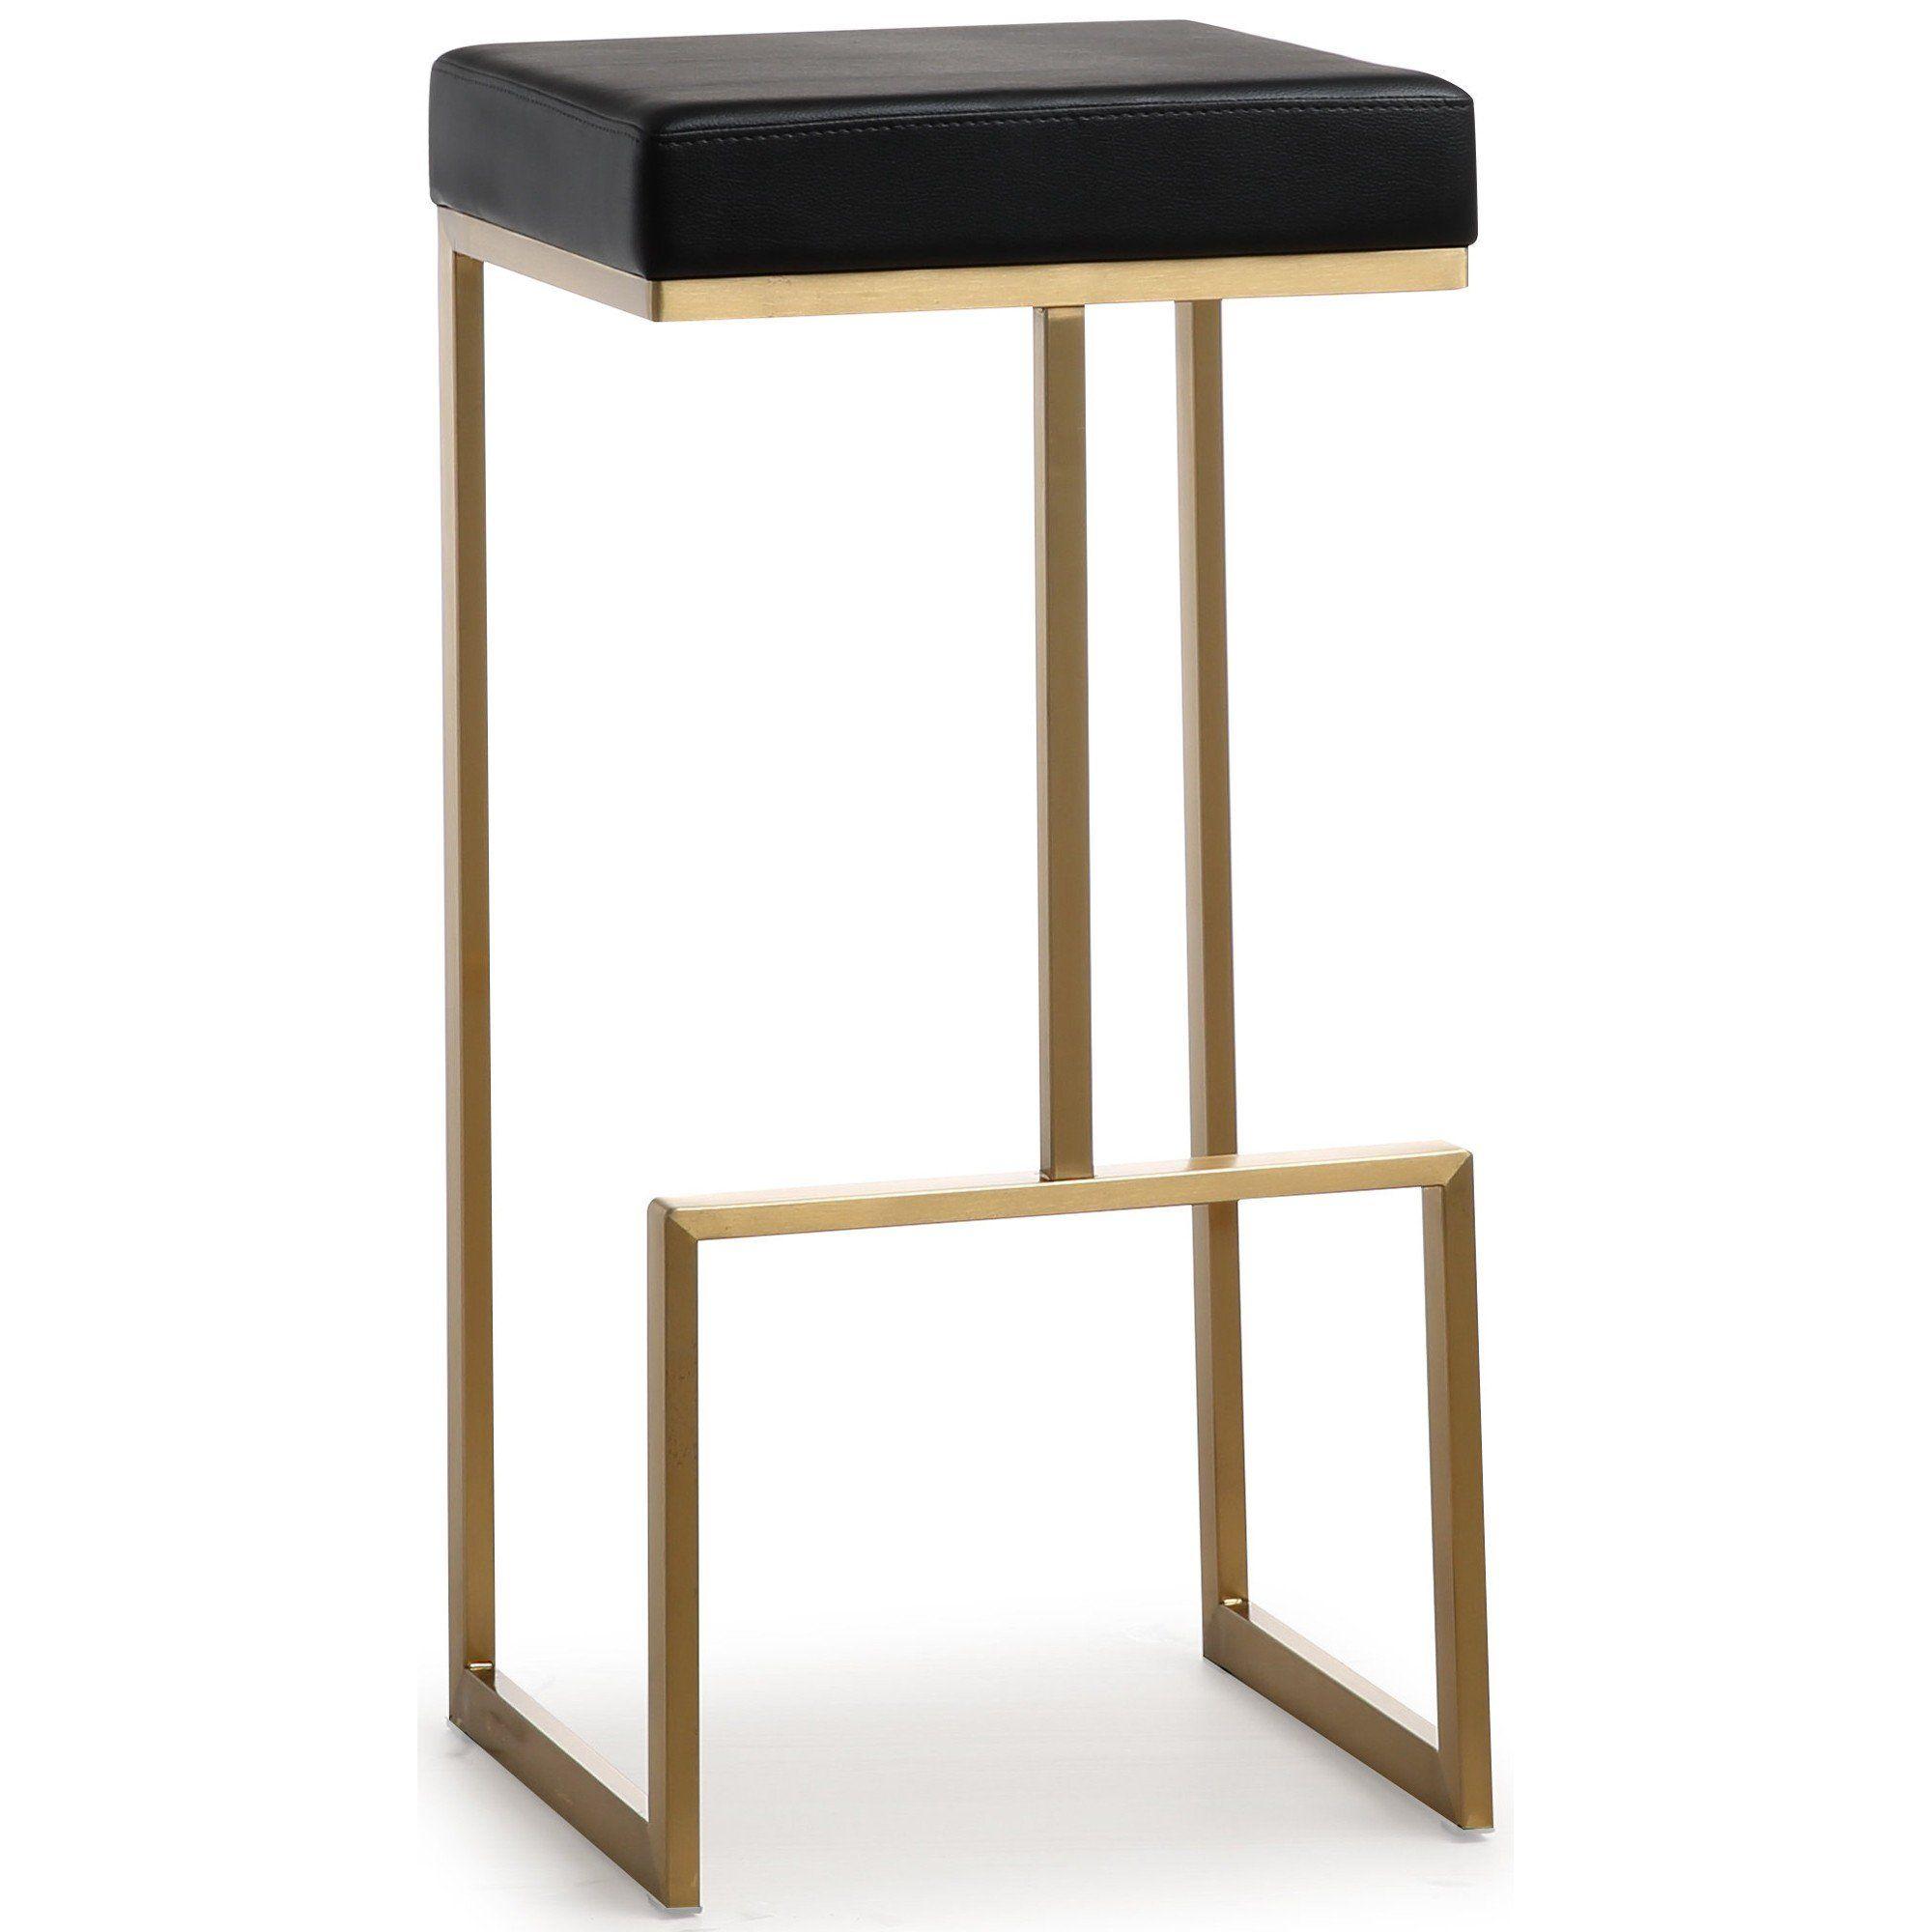 Phenomenal Ferrara Bar Stool Black Gold Base Set Of 2 In 2019 Unemploymentrelief Wooden Chair Designs For Living Room Unemploymentrelieforg